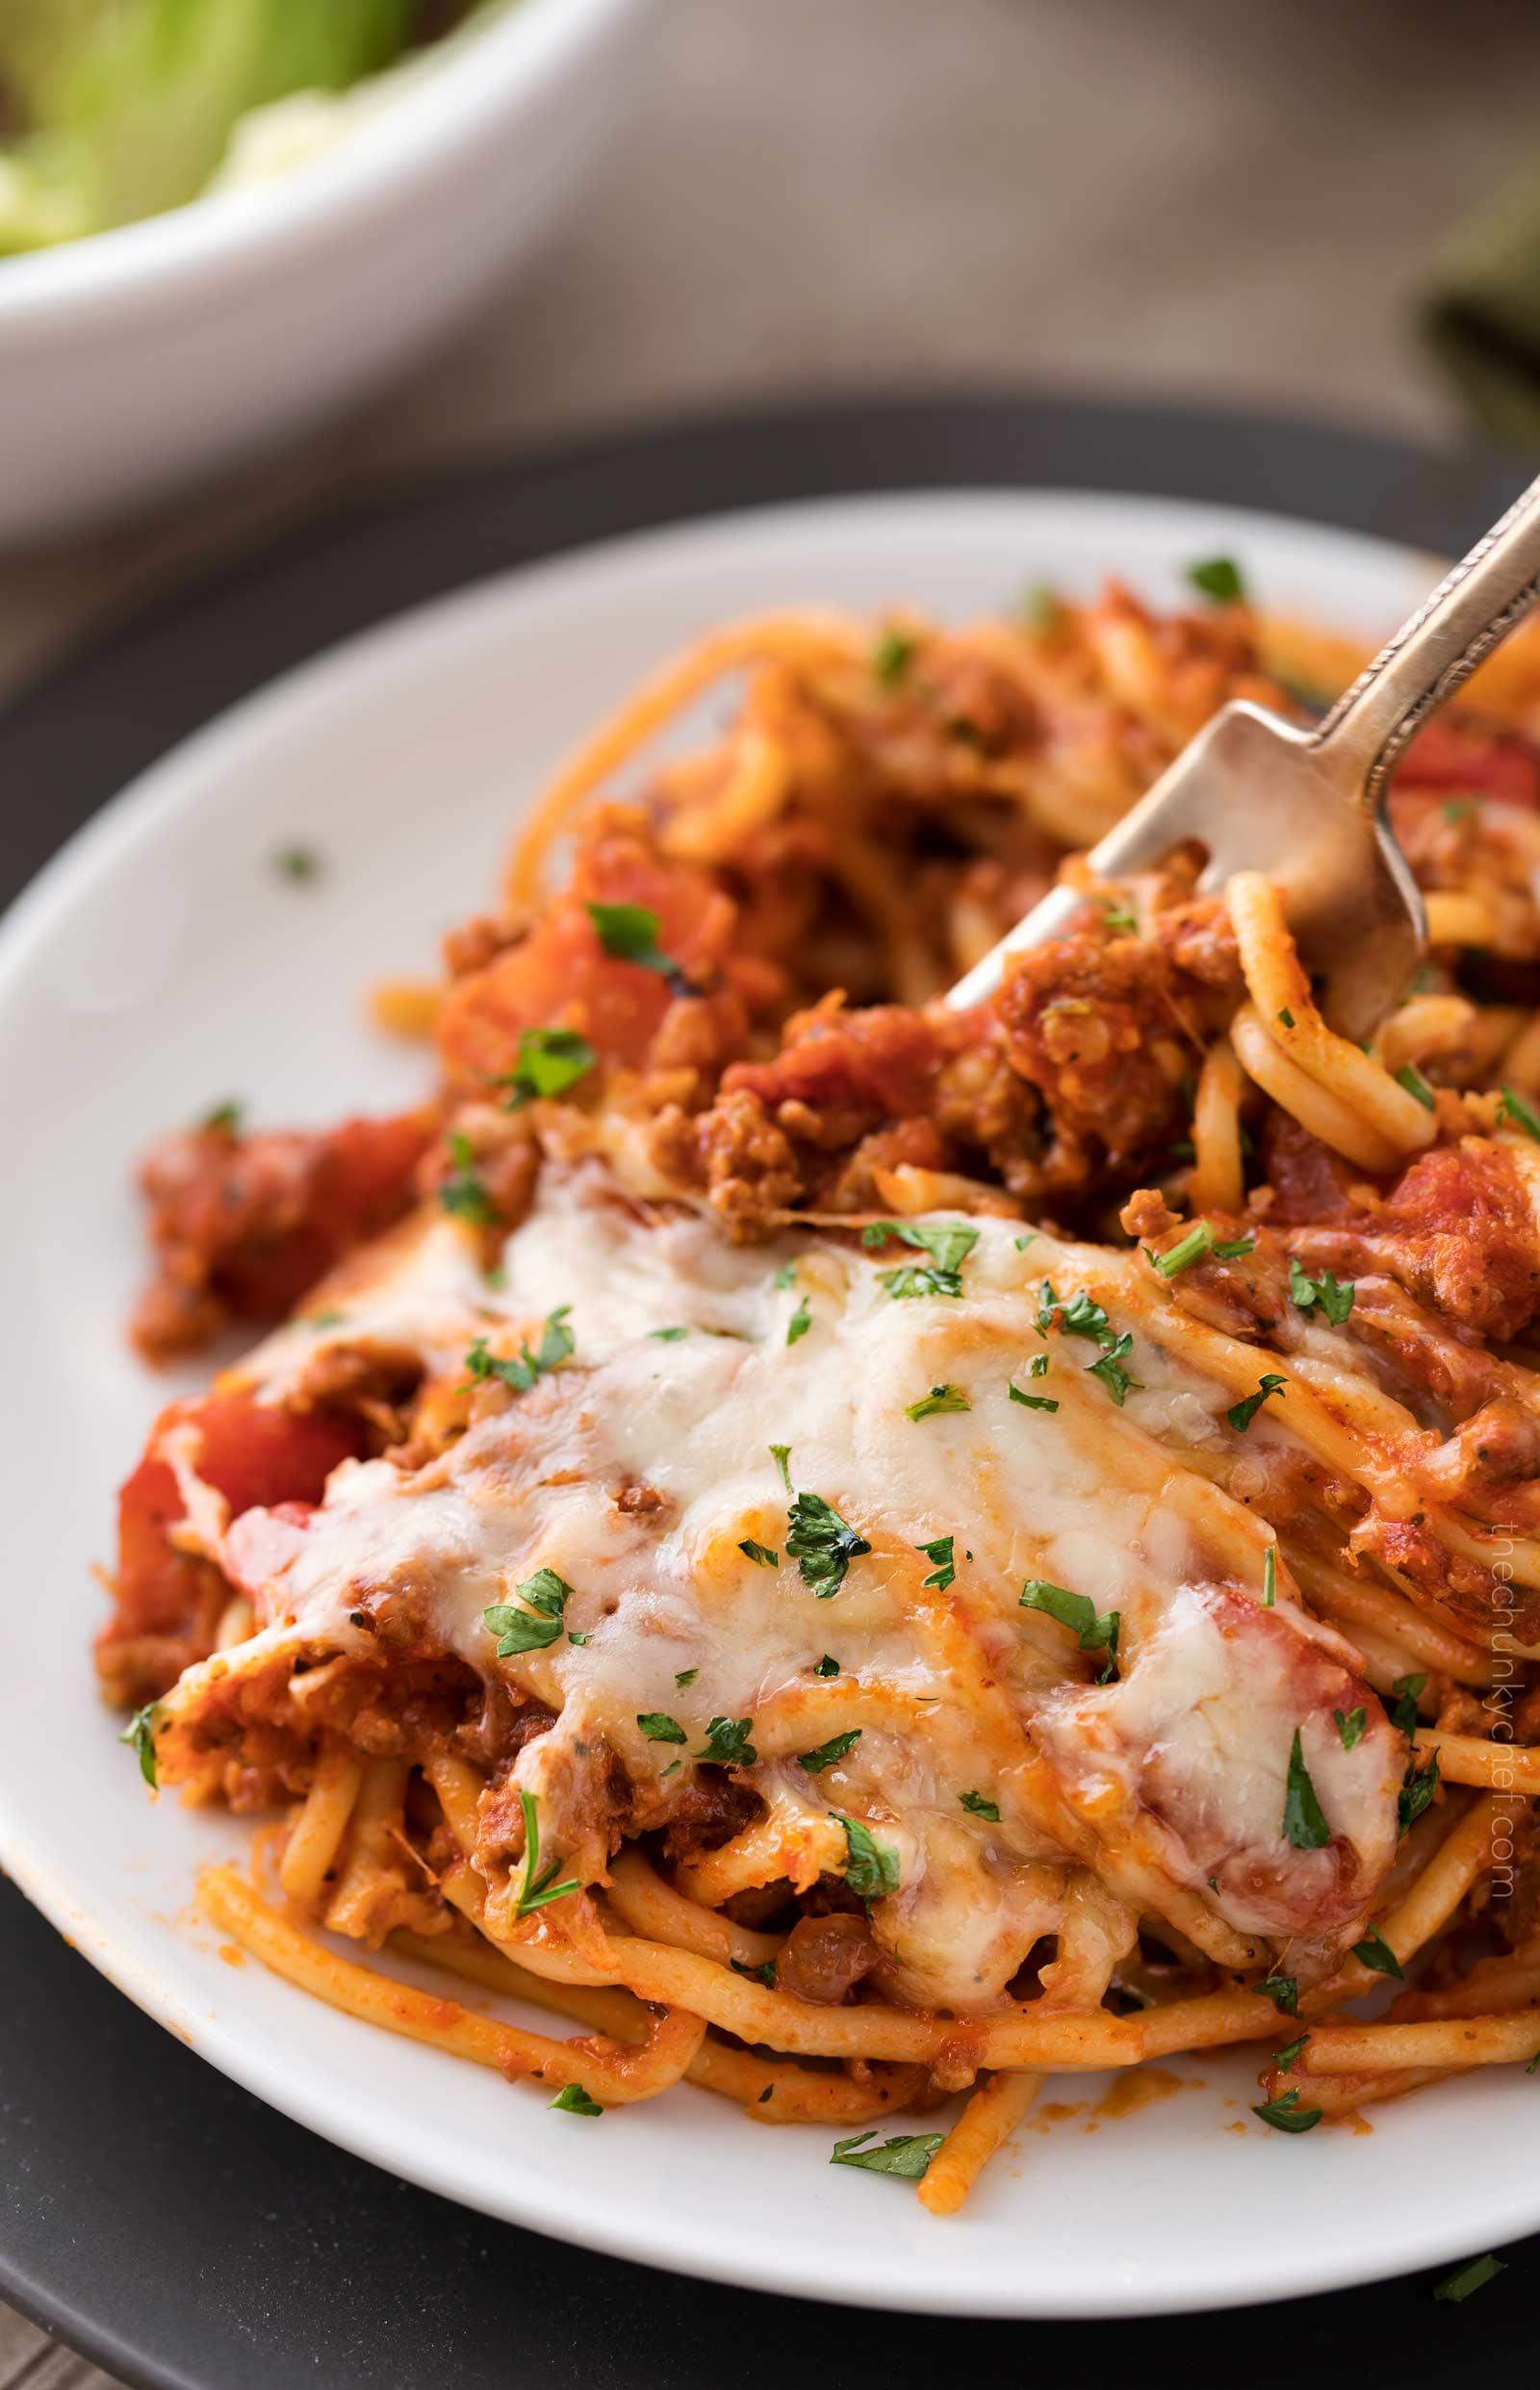 Plate of crockpot spaghetti